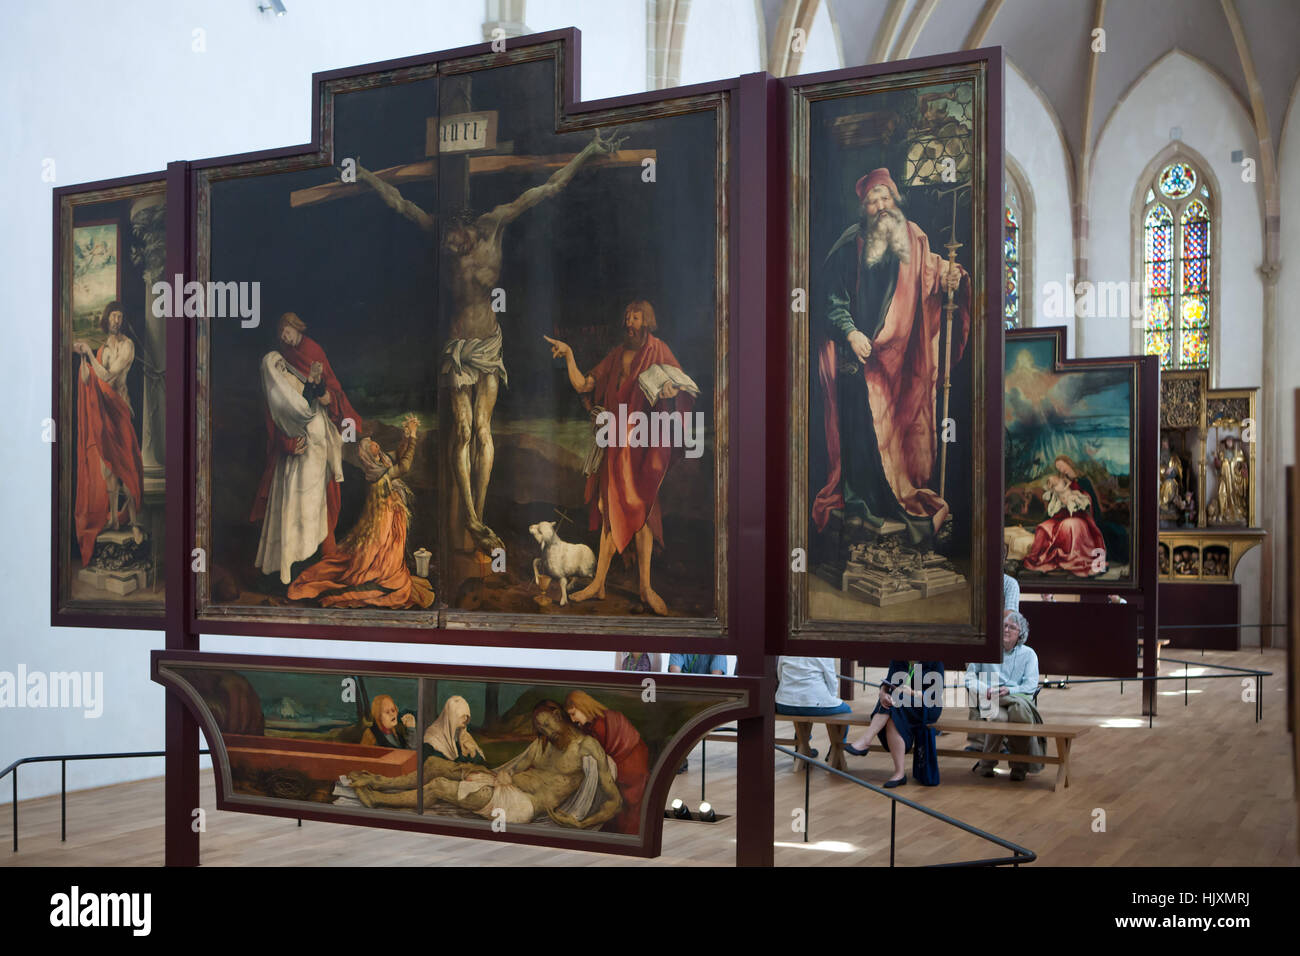 Visitors in front of the Isenheim Altarpiece (1512–1516) by German Renaissance painter Matthias Grunewald displayed Stock Photo